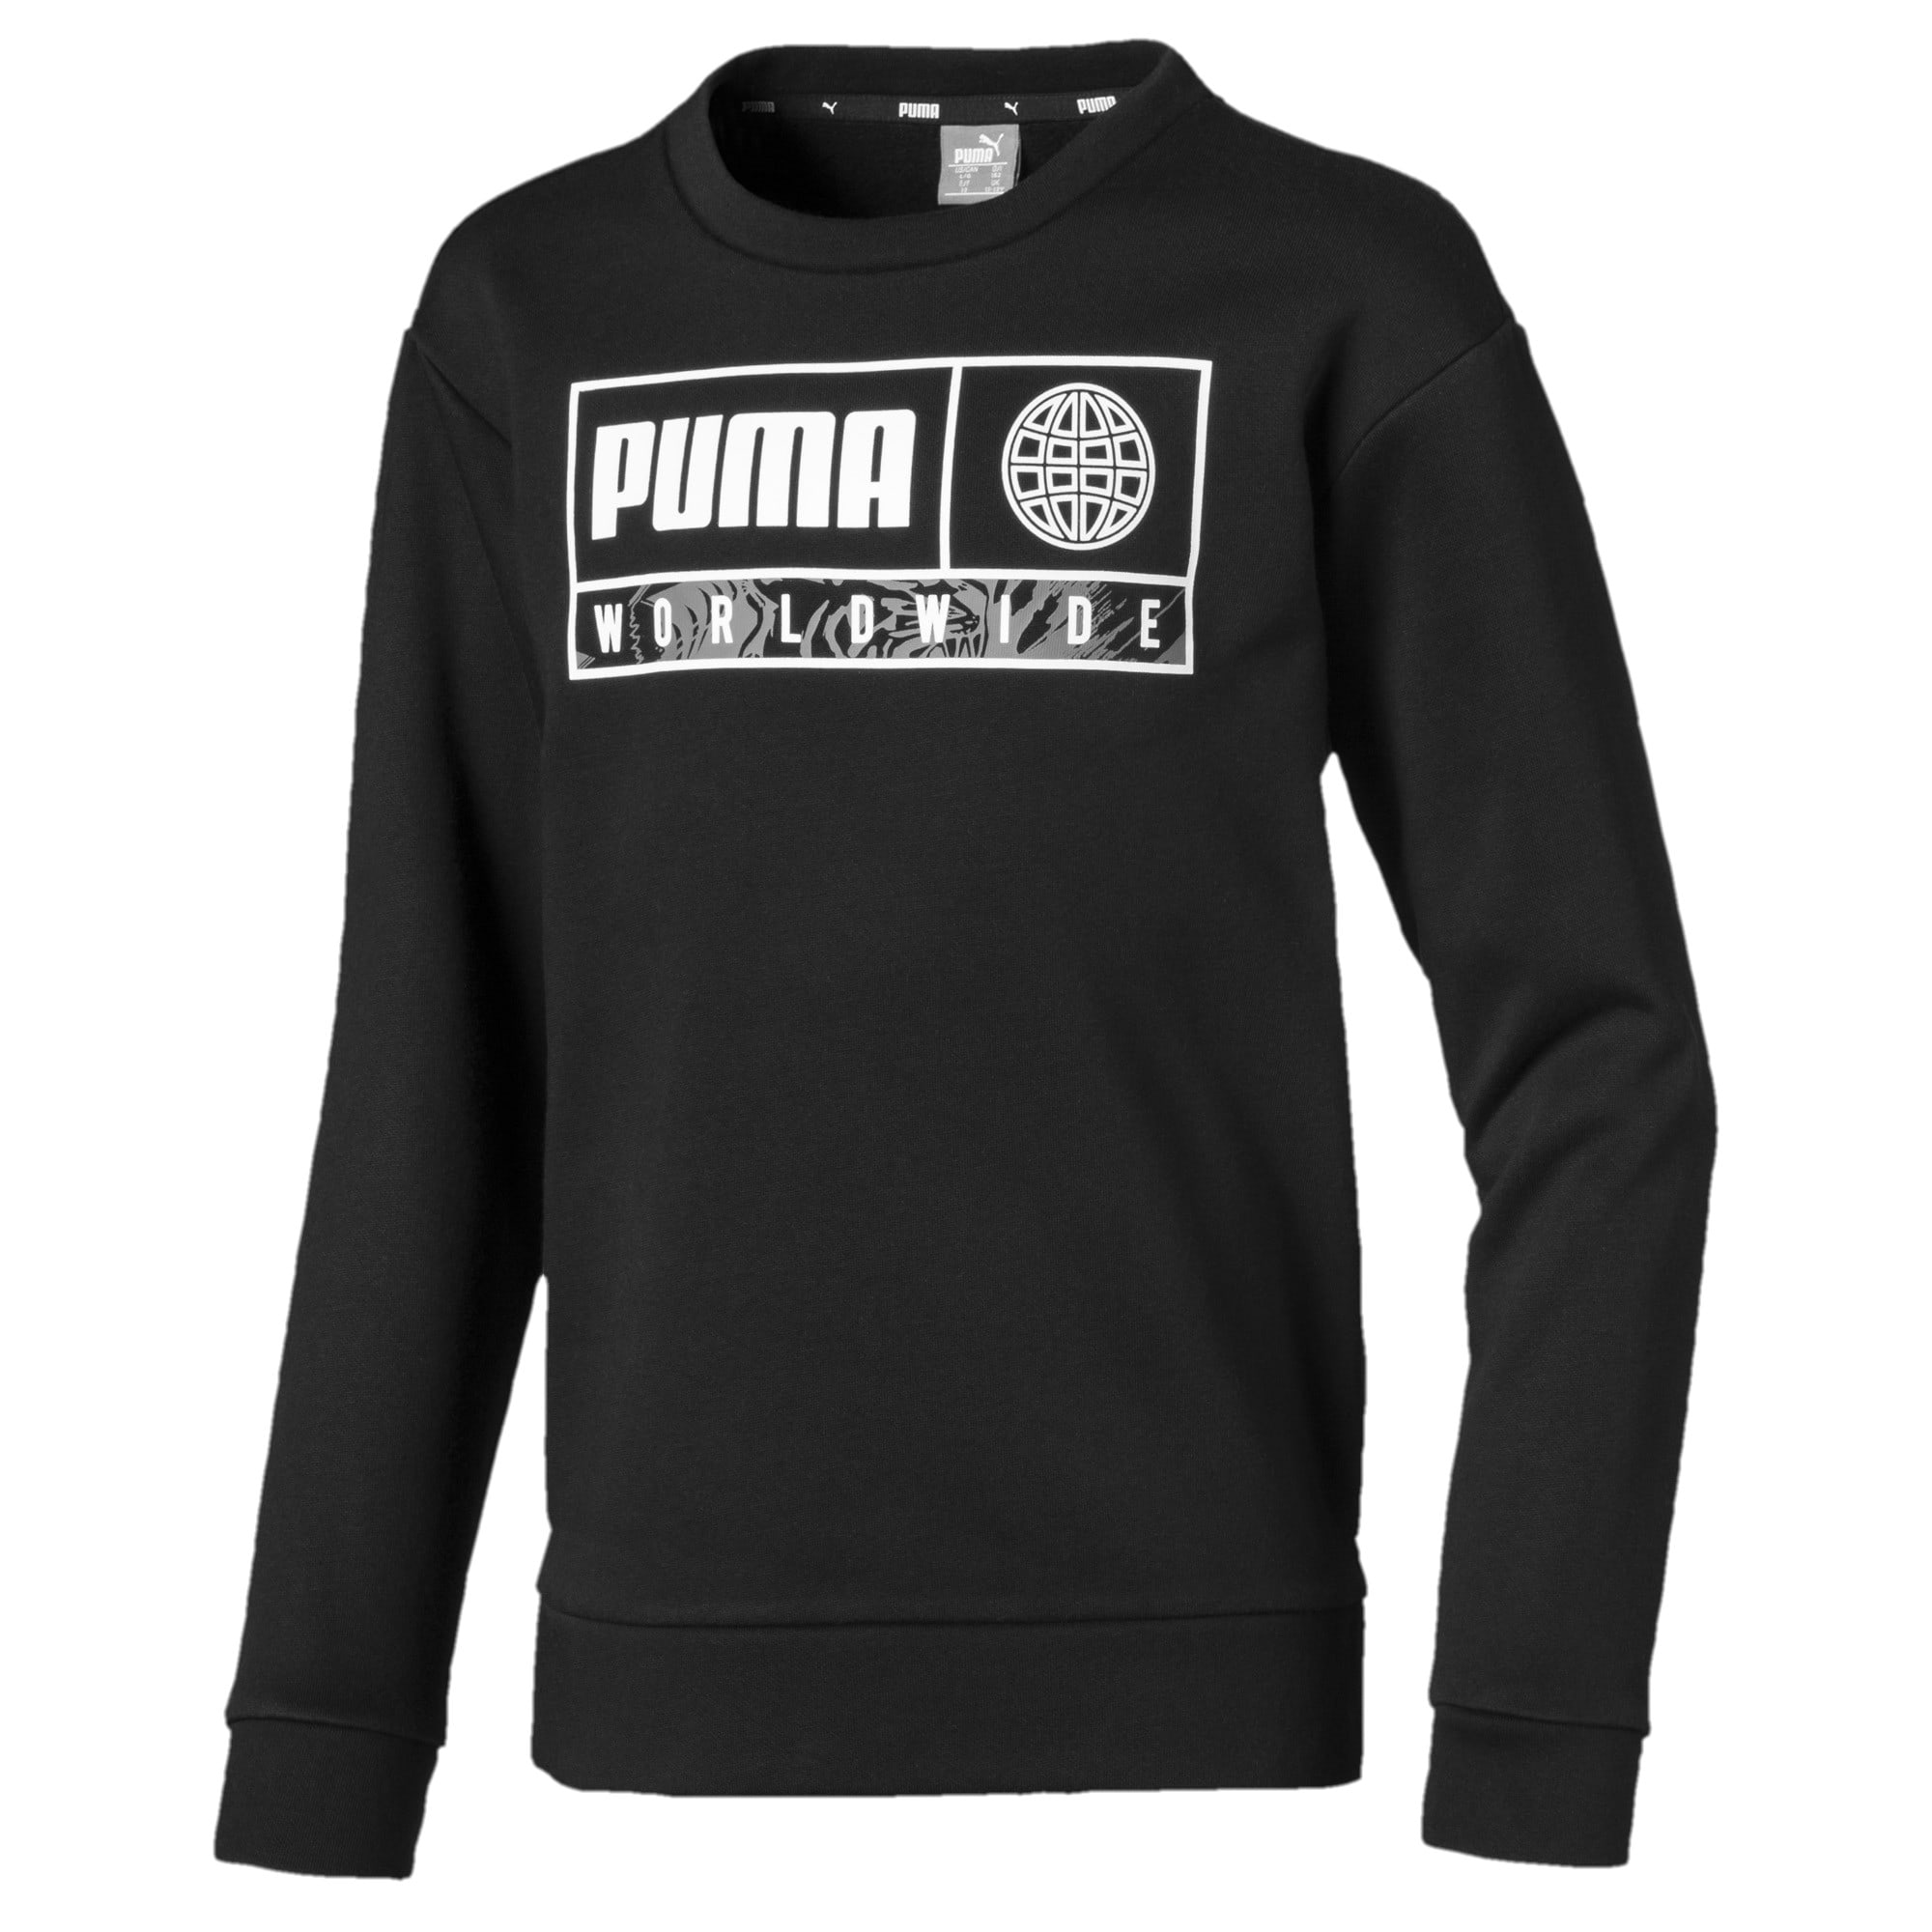 Thumbnail 1 of キッズ アルファ グラフィック クルー スウェット FL, Puma Black, medium-JPN